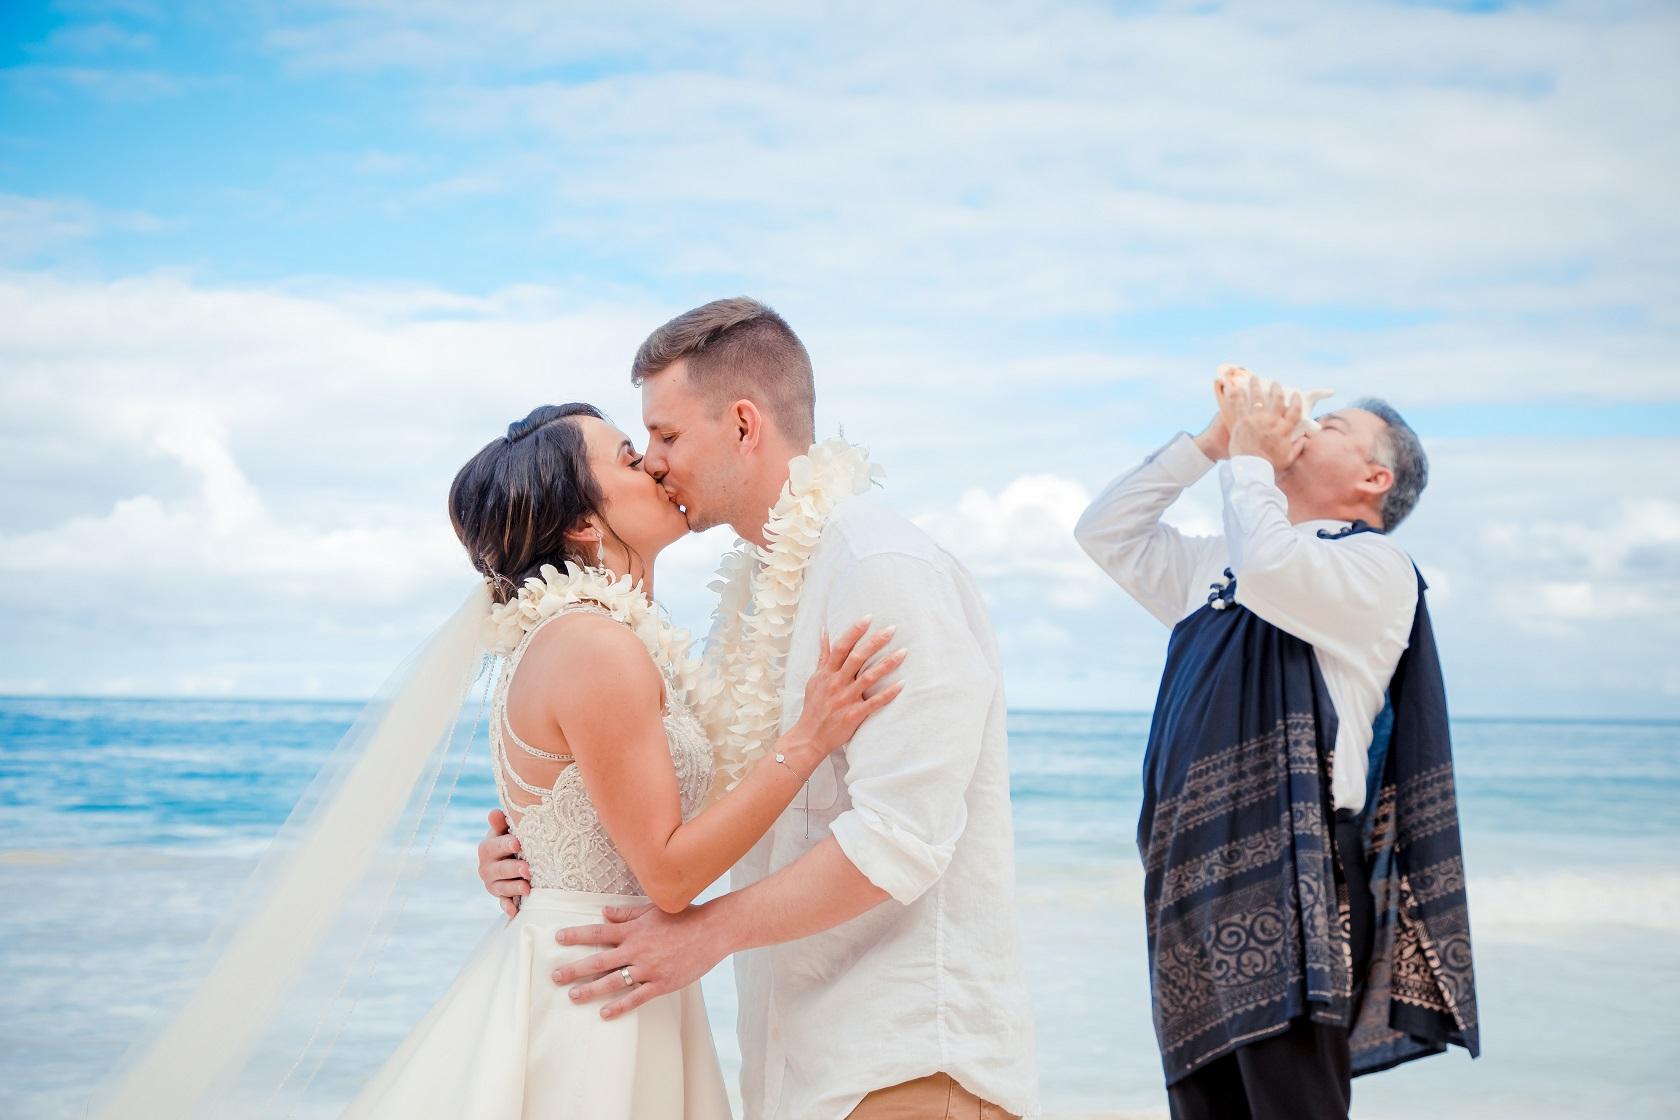 oahu beach elopement wedding ceremony bride and groom wedding kiss